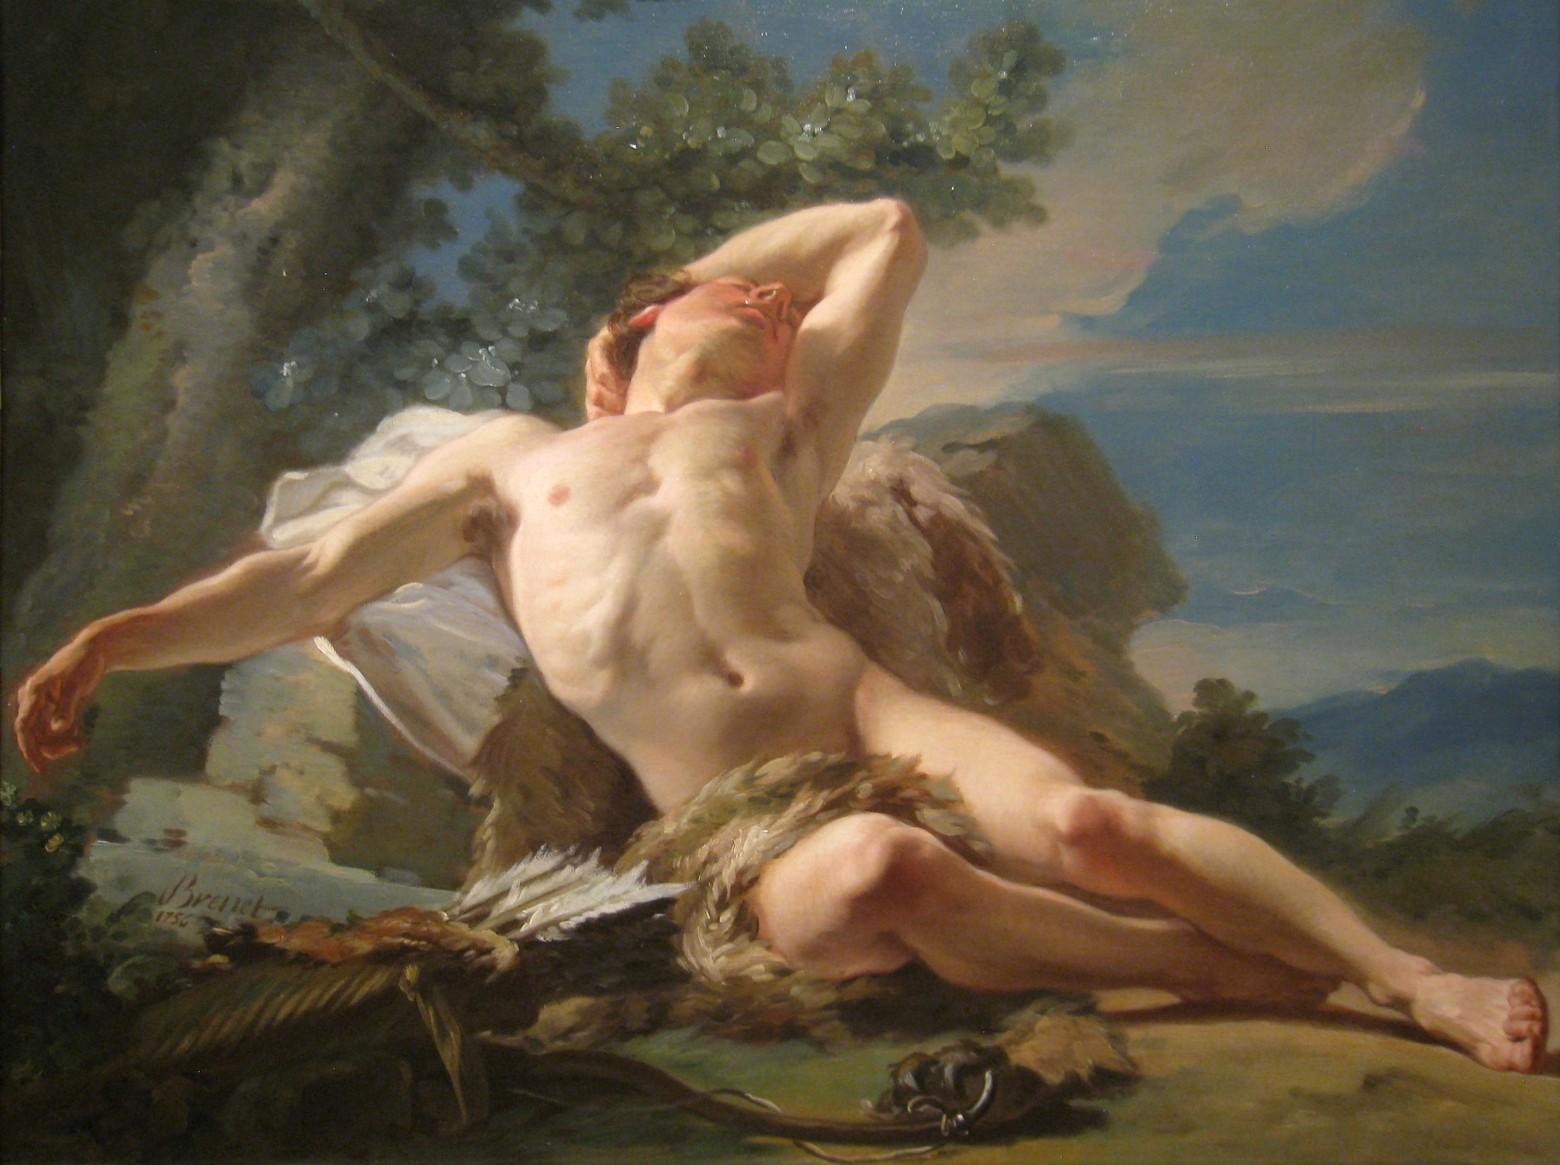 Sleeping_Encymion_1756_by_Nicolas-Guy_Brenet_1728-1792_-_IMG_7257-e1407174310547